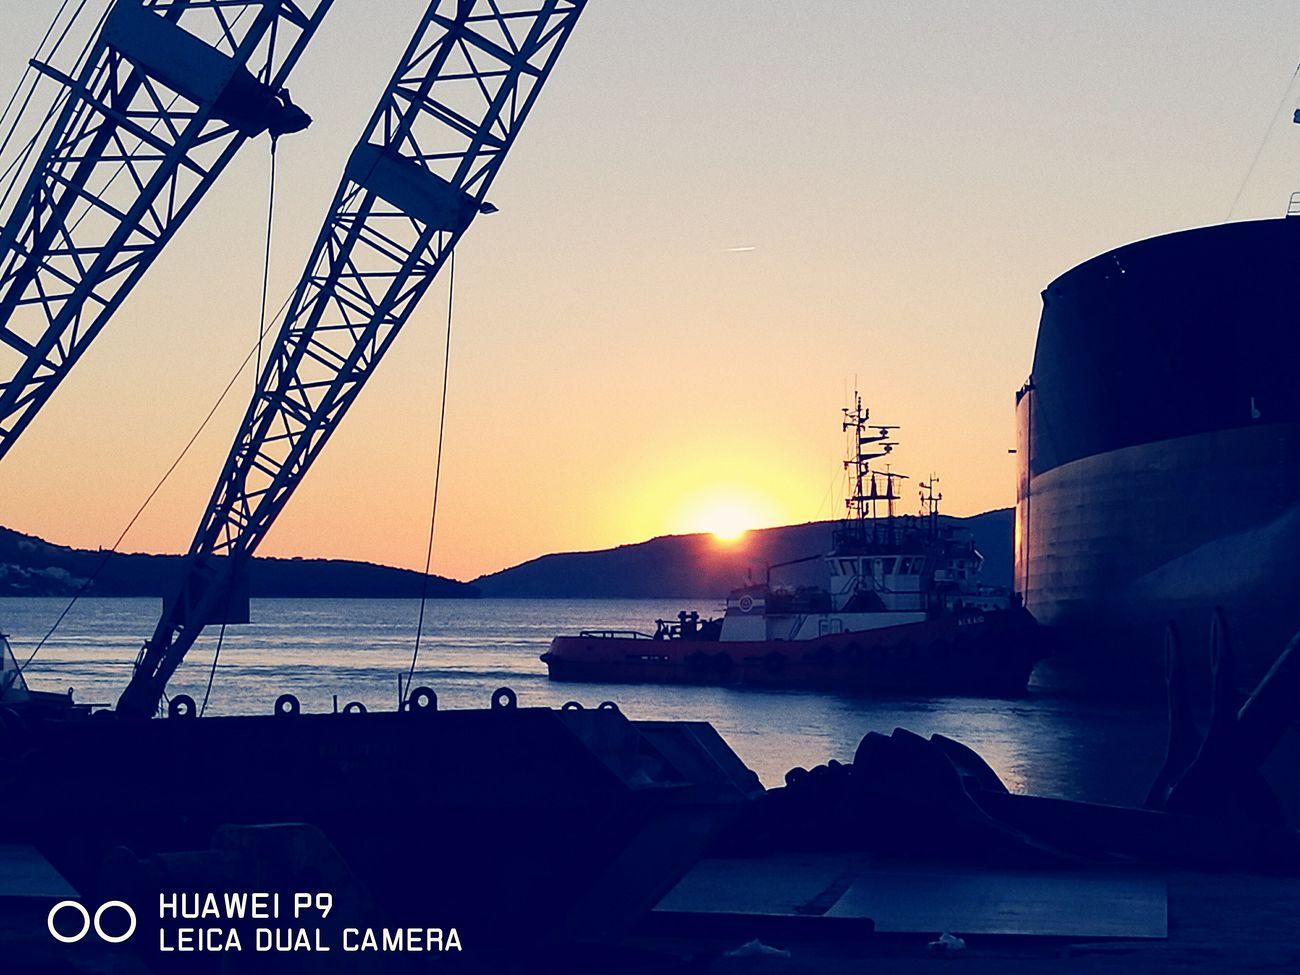 Shipyard Shiplife Ships⚓️⛵️🚢 Shipsunset Sunset Beautiful Nature Enjoying Life First Eyeem Photo Taking Photos Outdoors No People